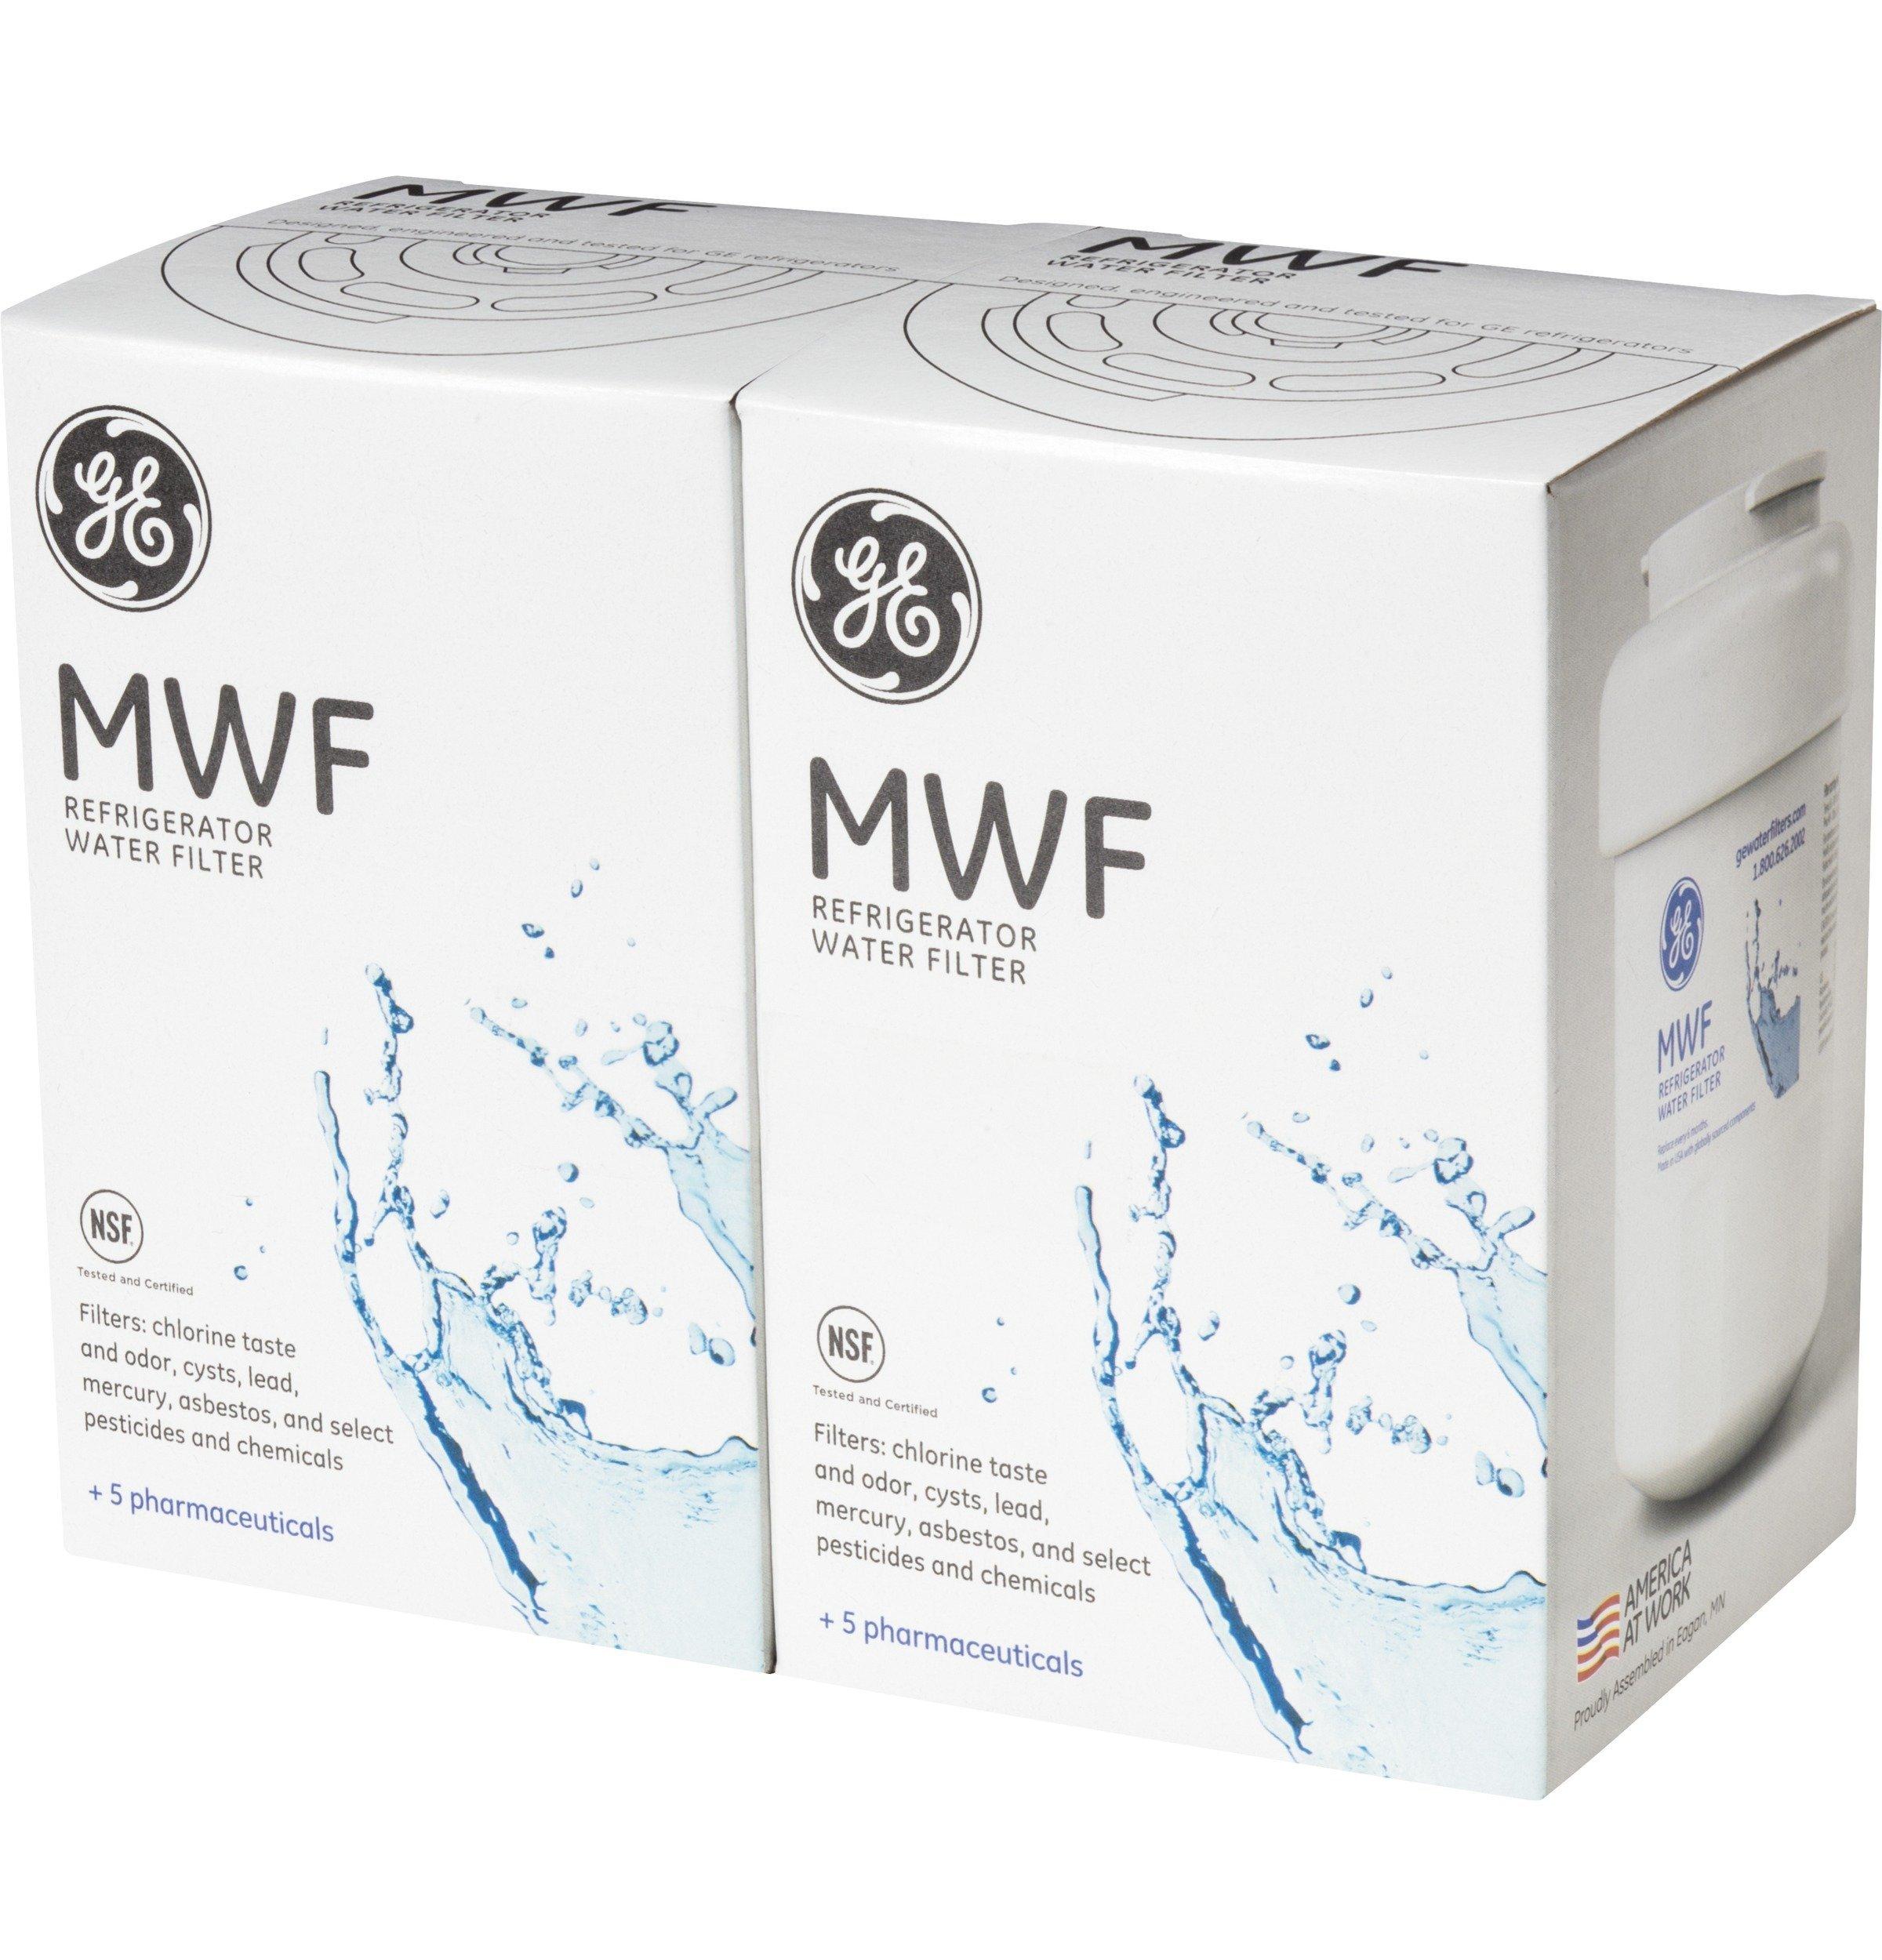 GE SmartWater MWFP Refrigerator Water Filter, 2-Pack